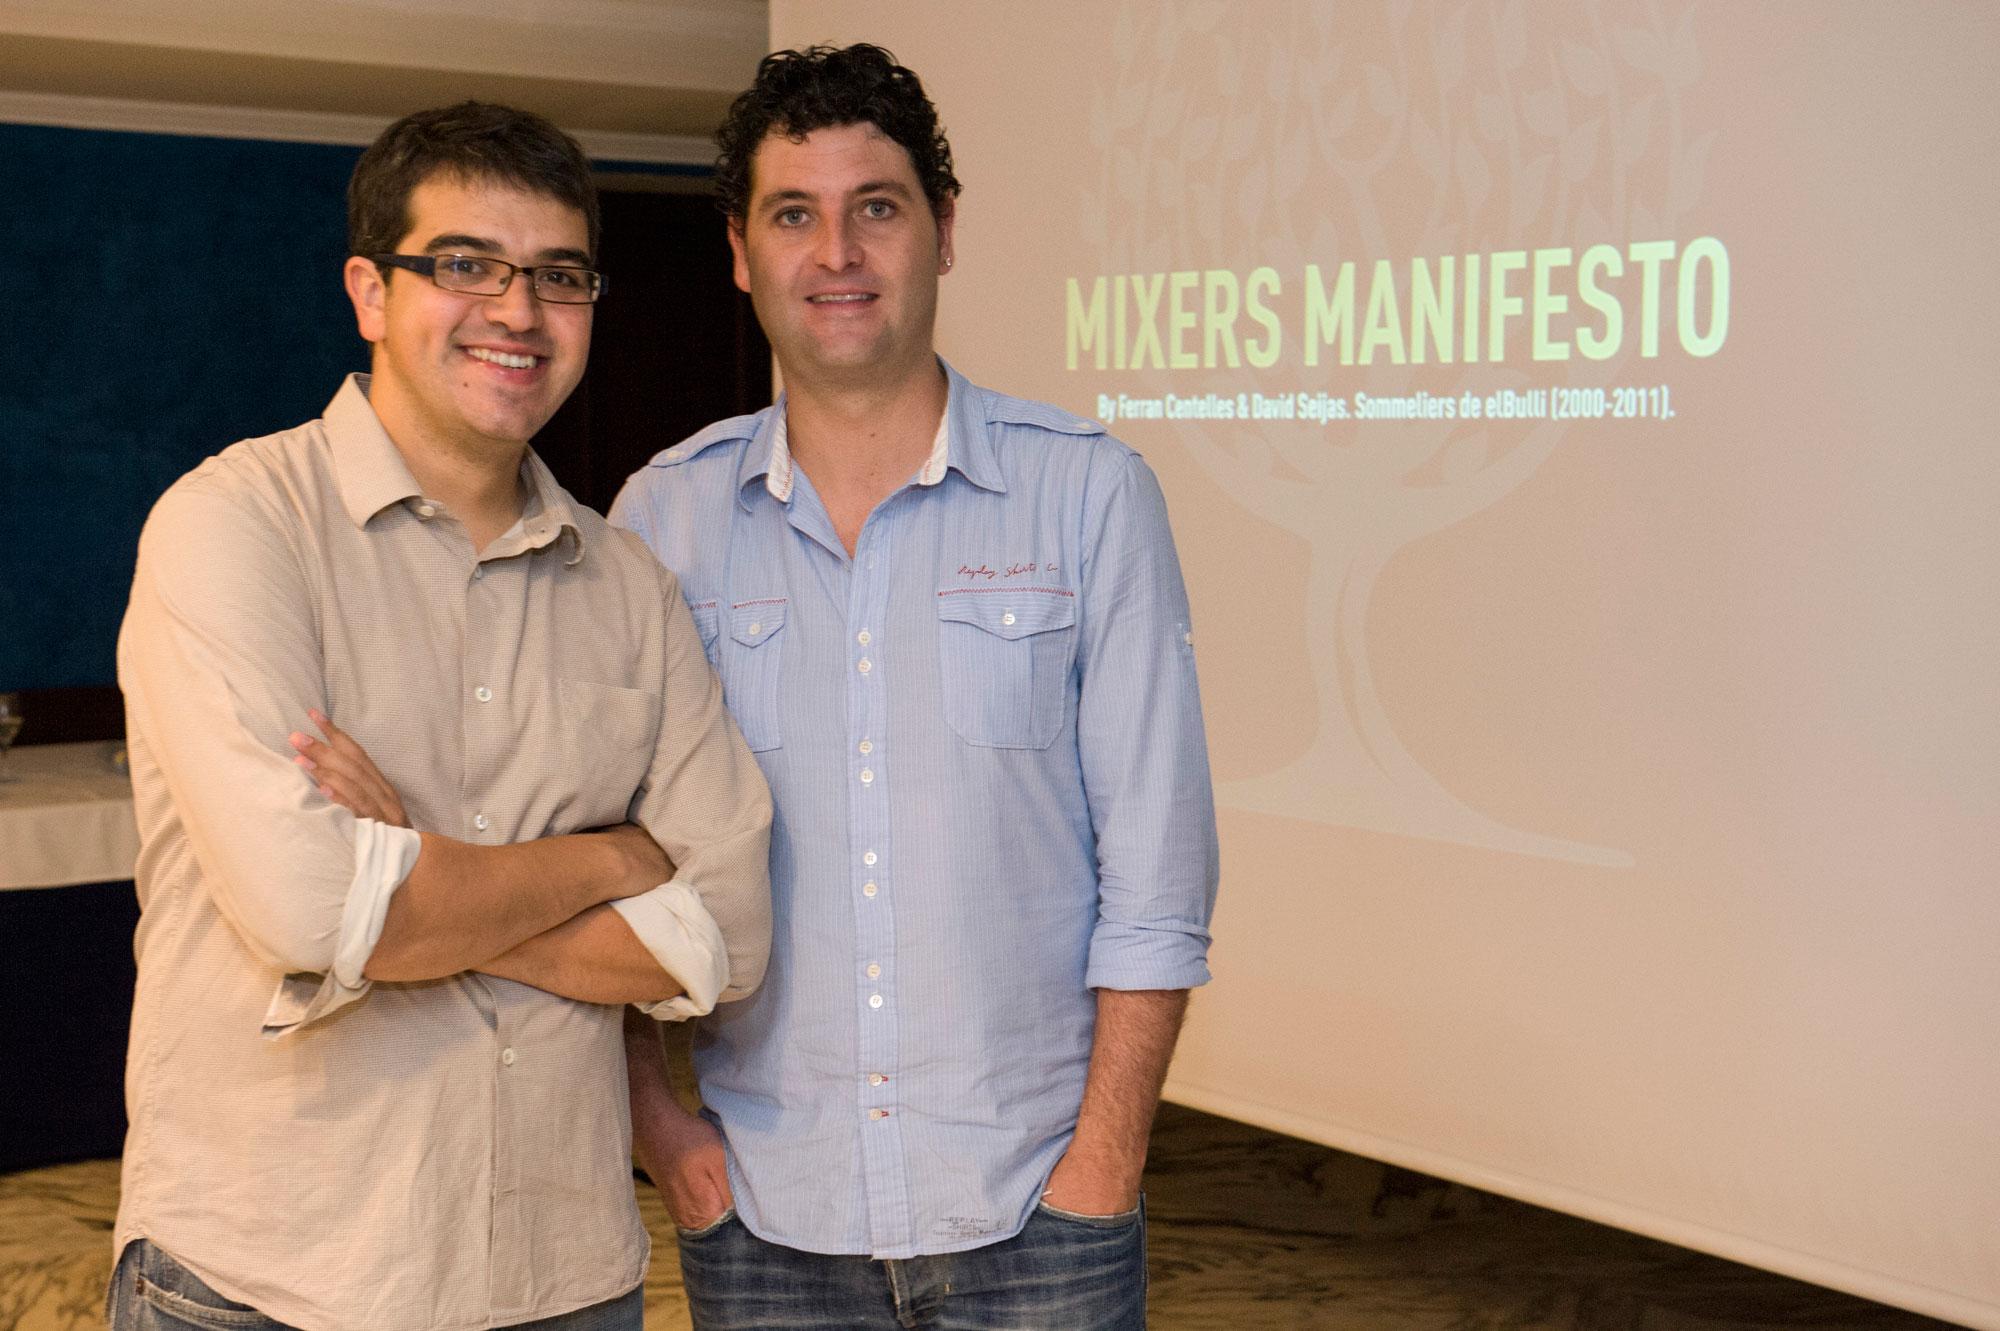 Ferran Centelles y David Seijas, Mixers Manifesto de Fever Tree